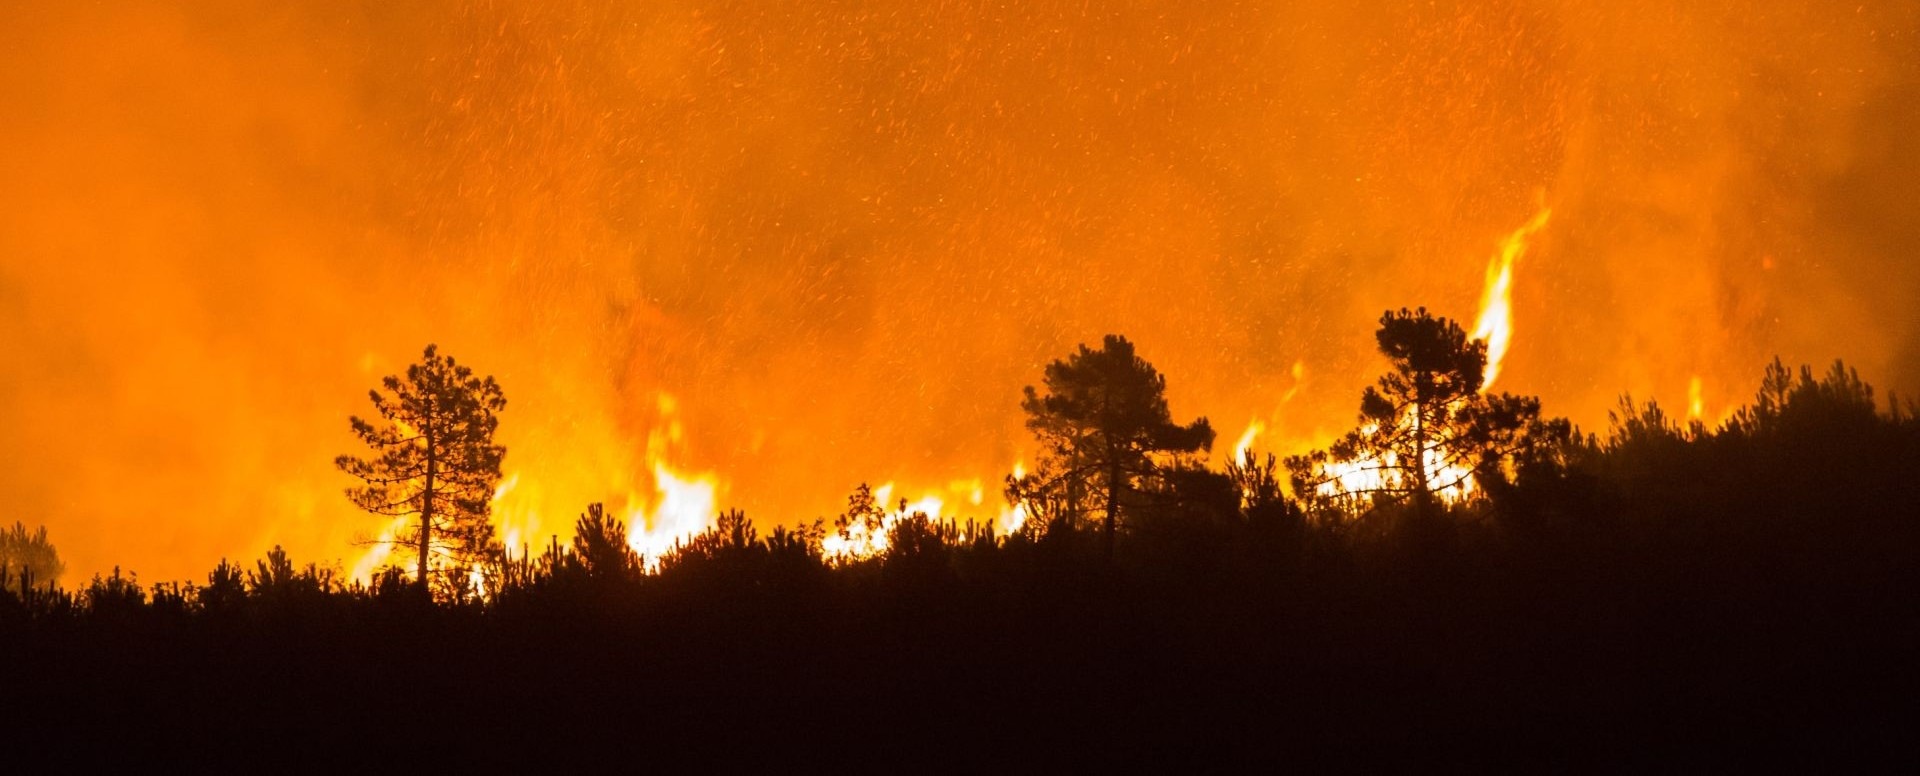 VIDEO: Šumski požar u Alberti vidljiv je iz svemira